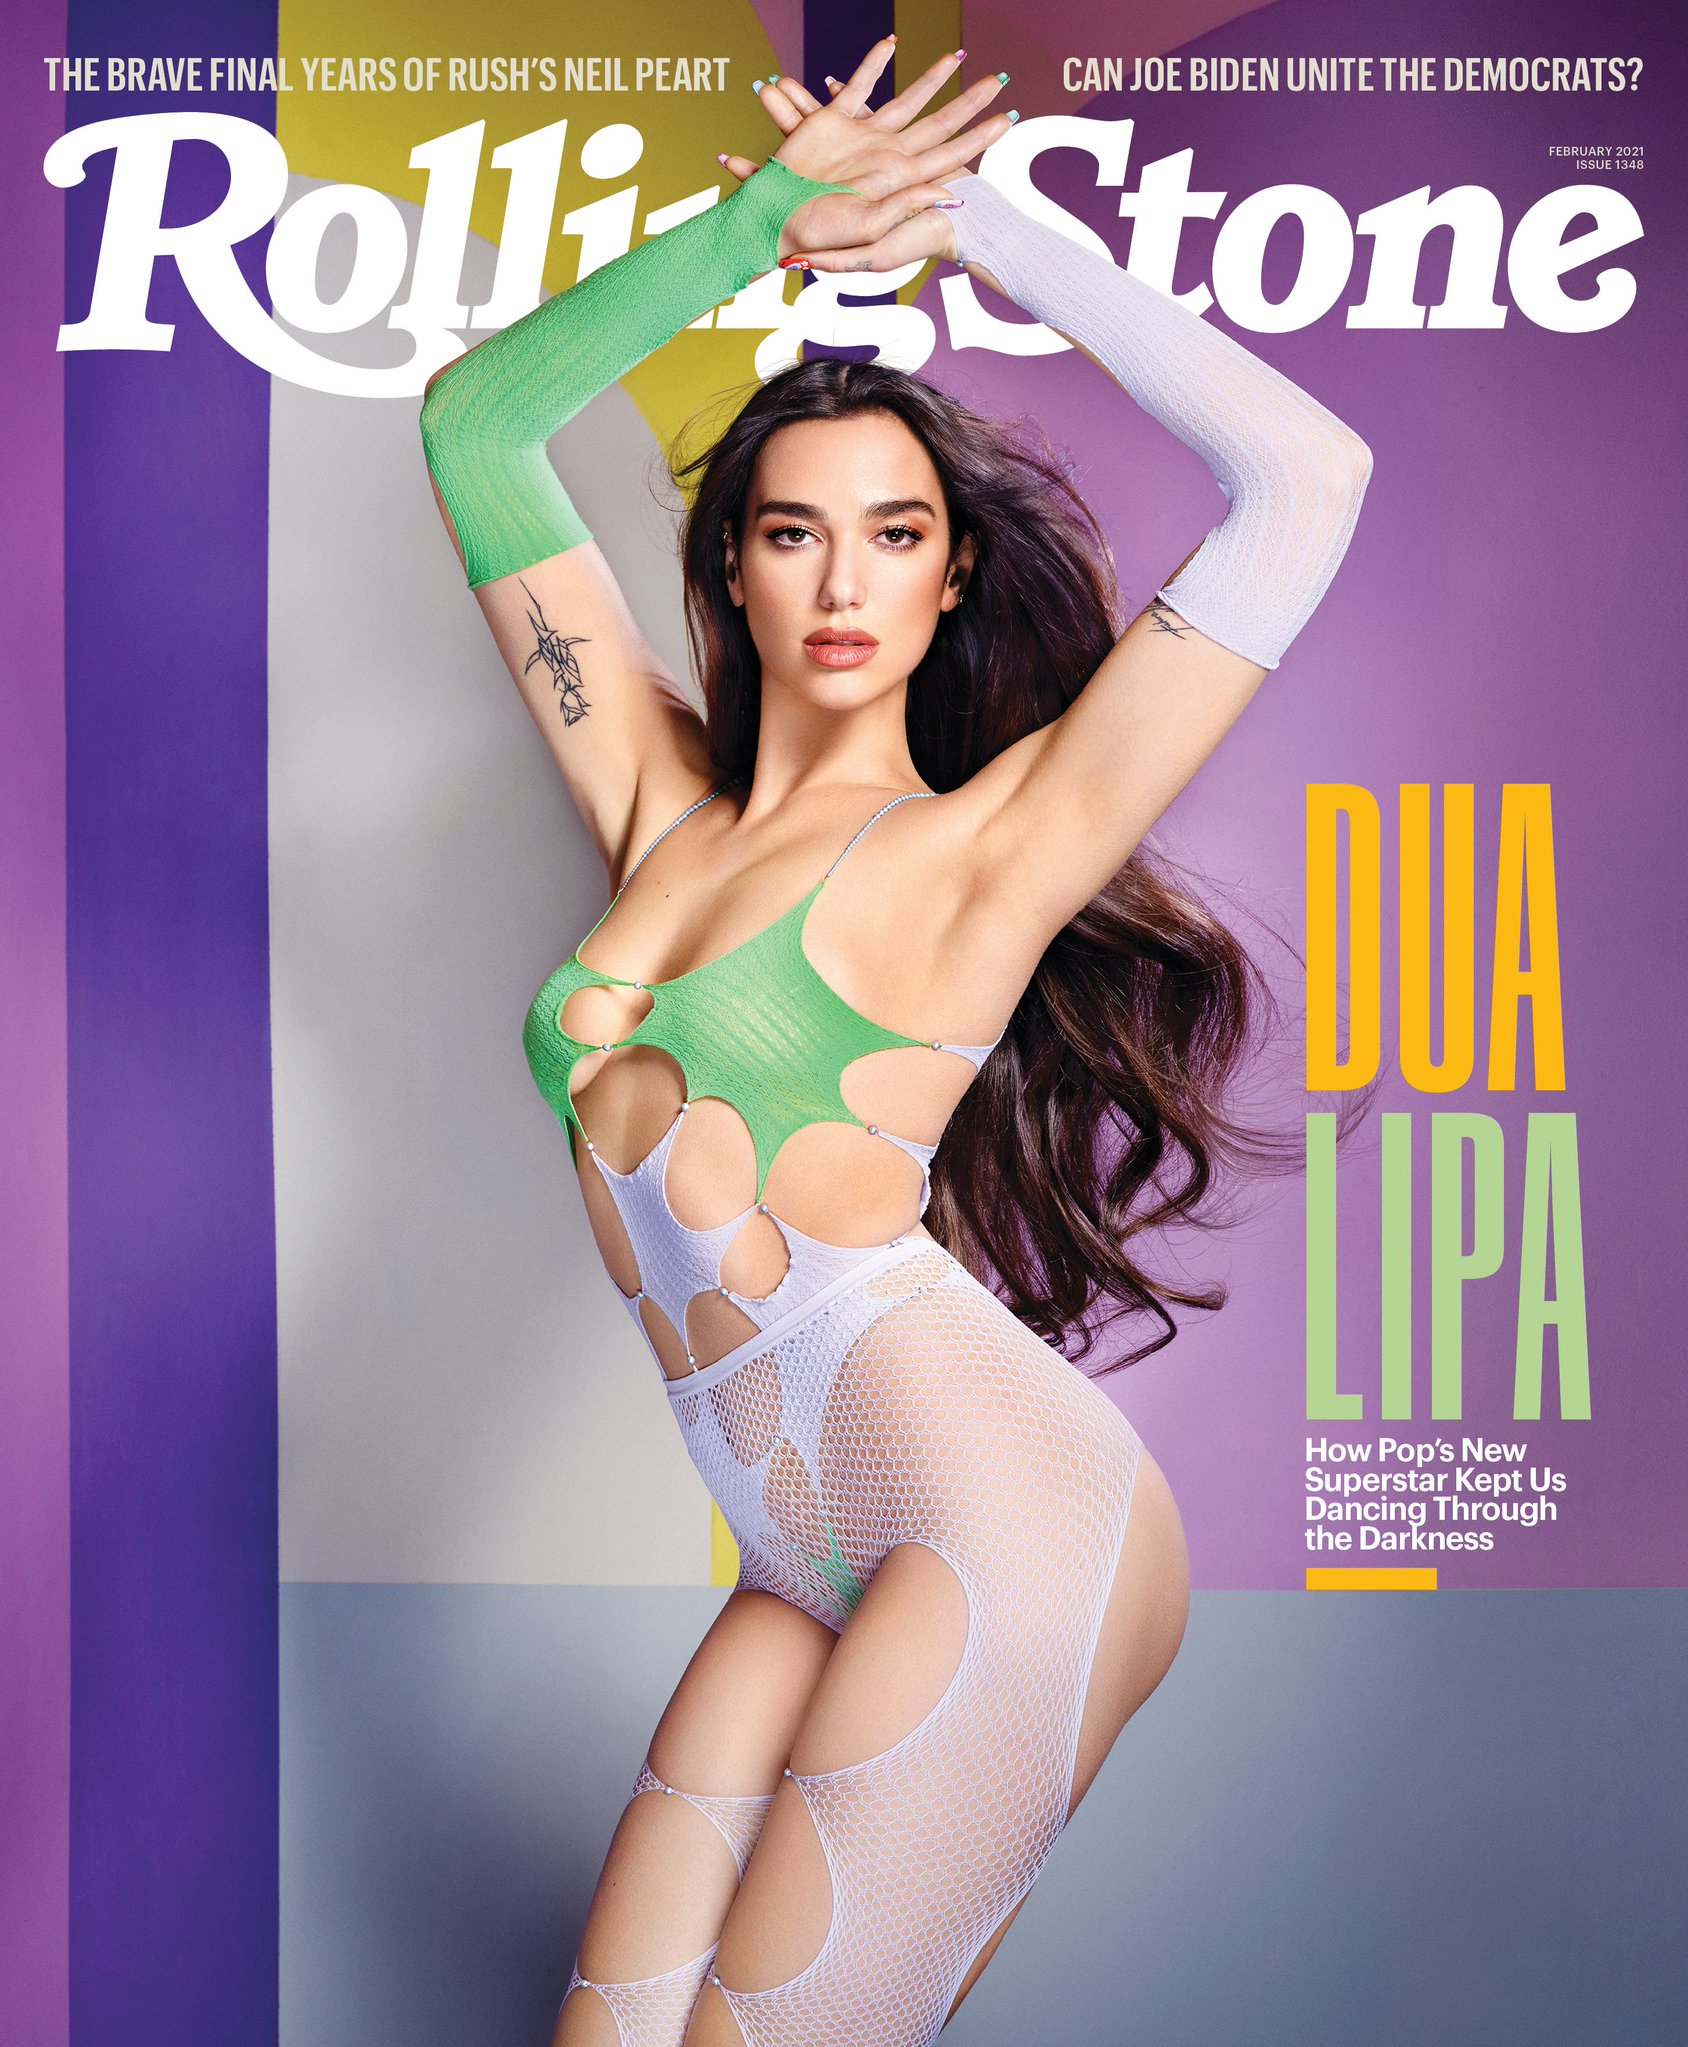 dua-lipa-covers-rolling-stones-february-issue